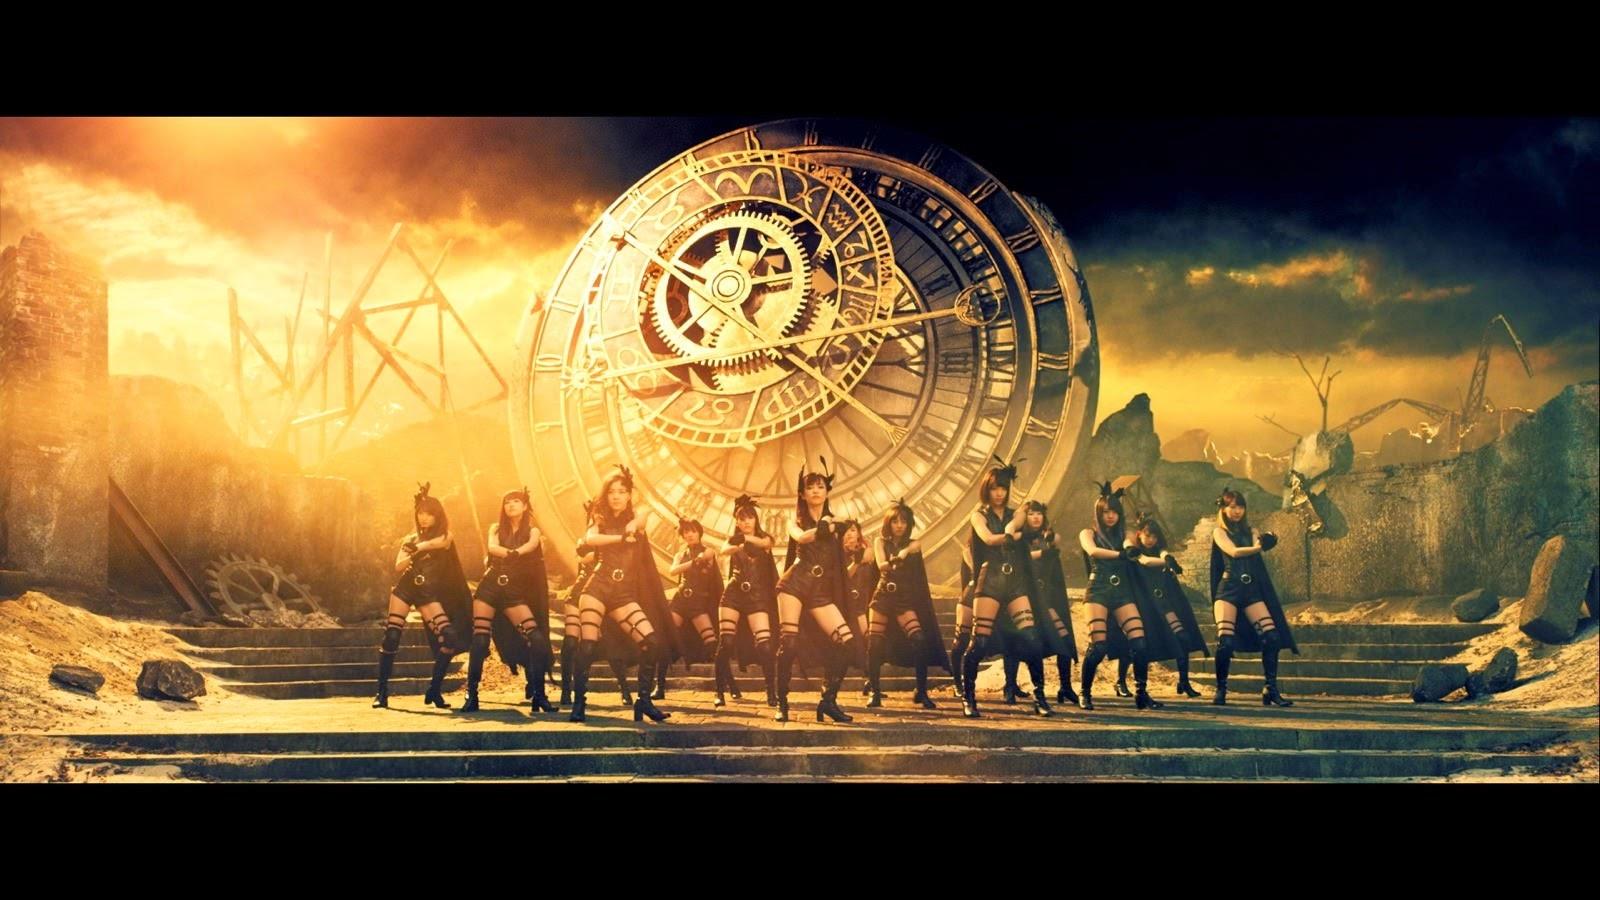 AKB48 僕たちは戦わない ジャケット 収録曲 Bokutachi wa Tatakawanai Cover + Tracklist